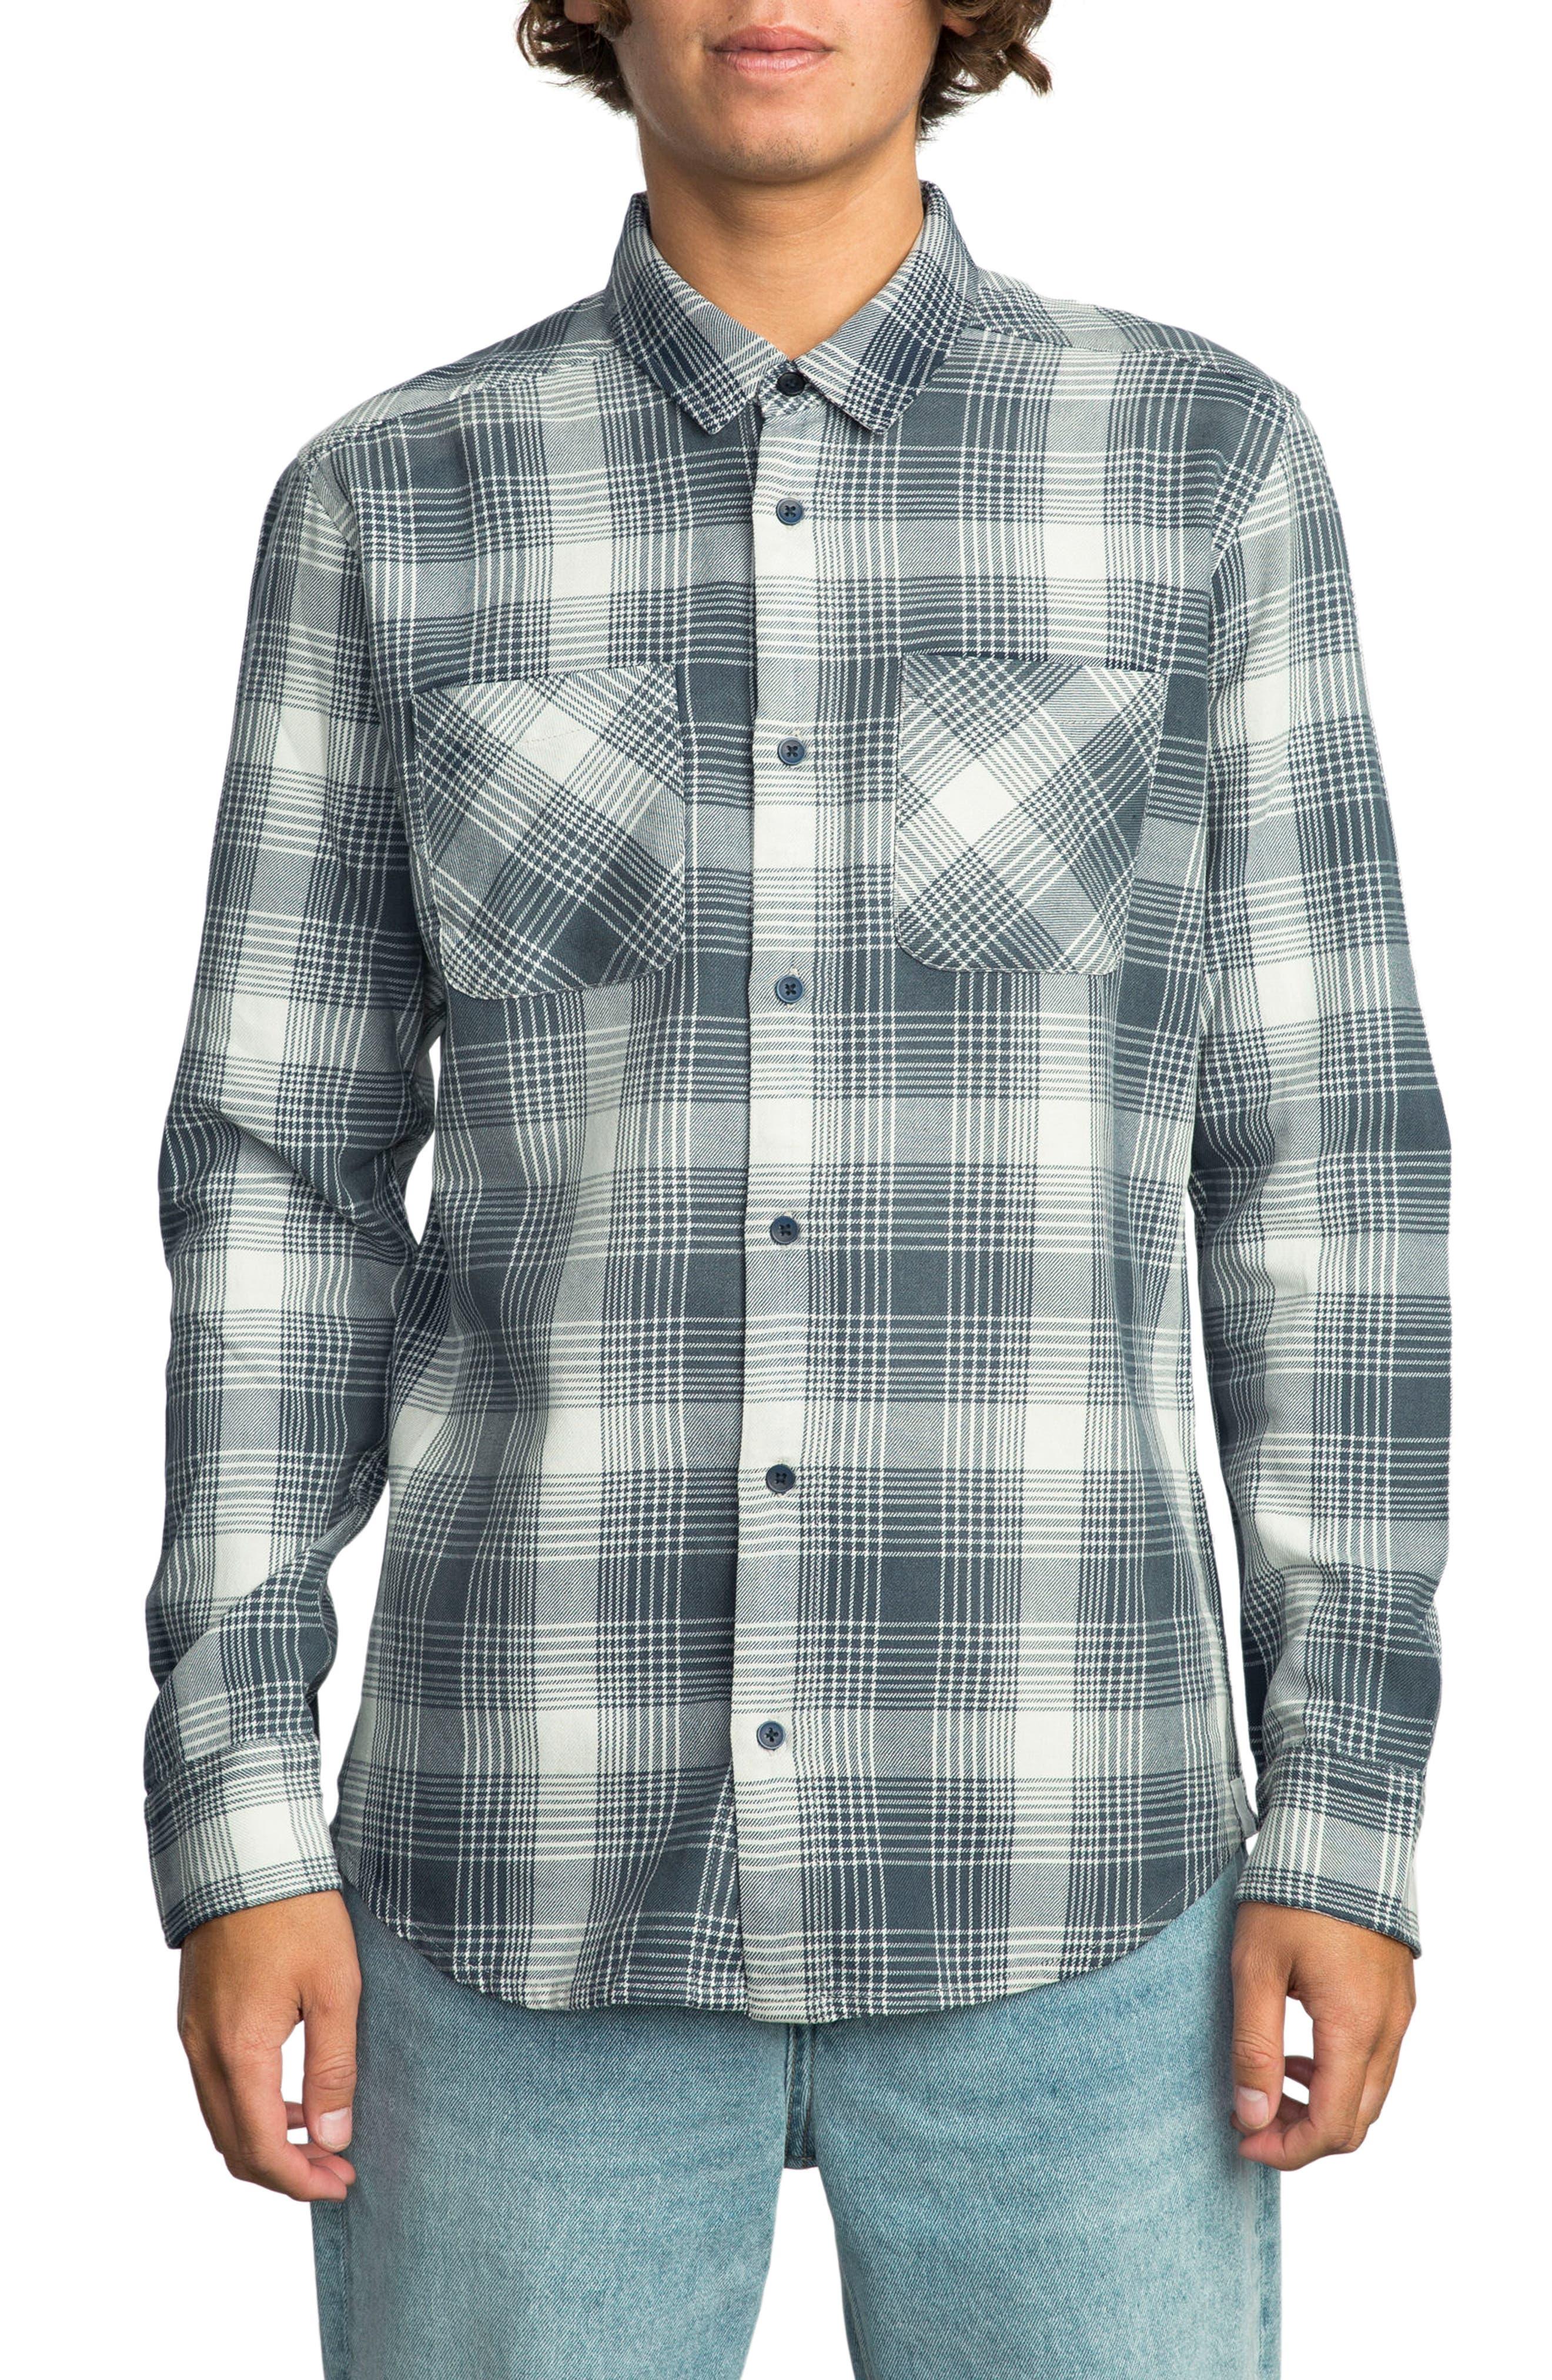 Main Image - RVCA Plaid Woven Shirt